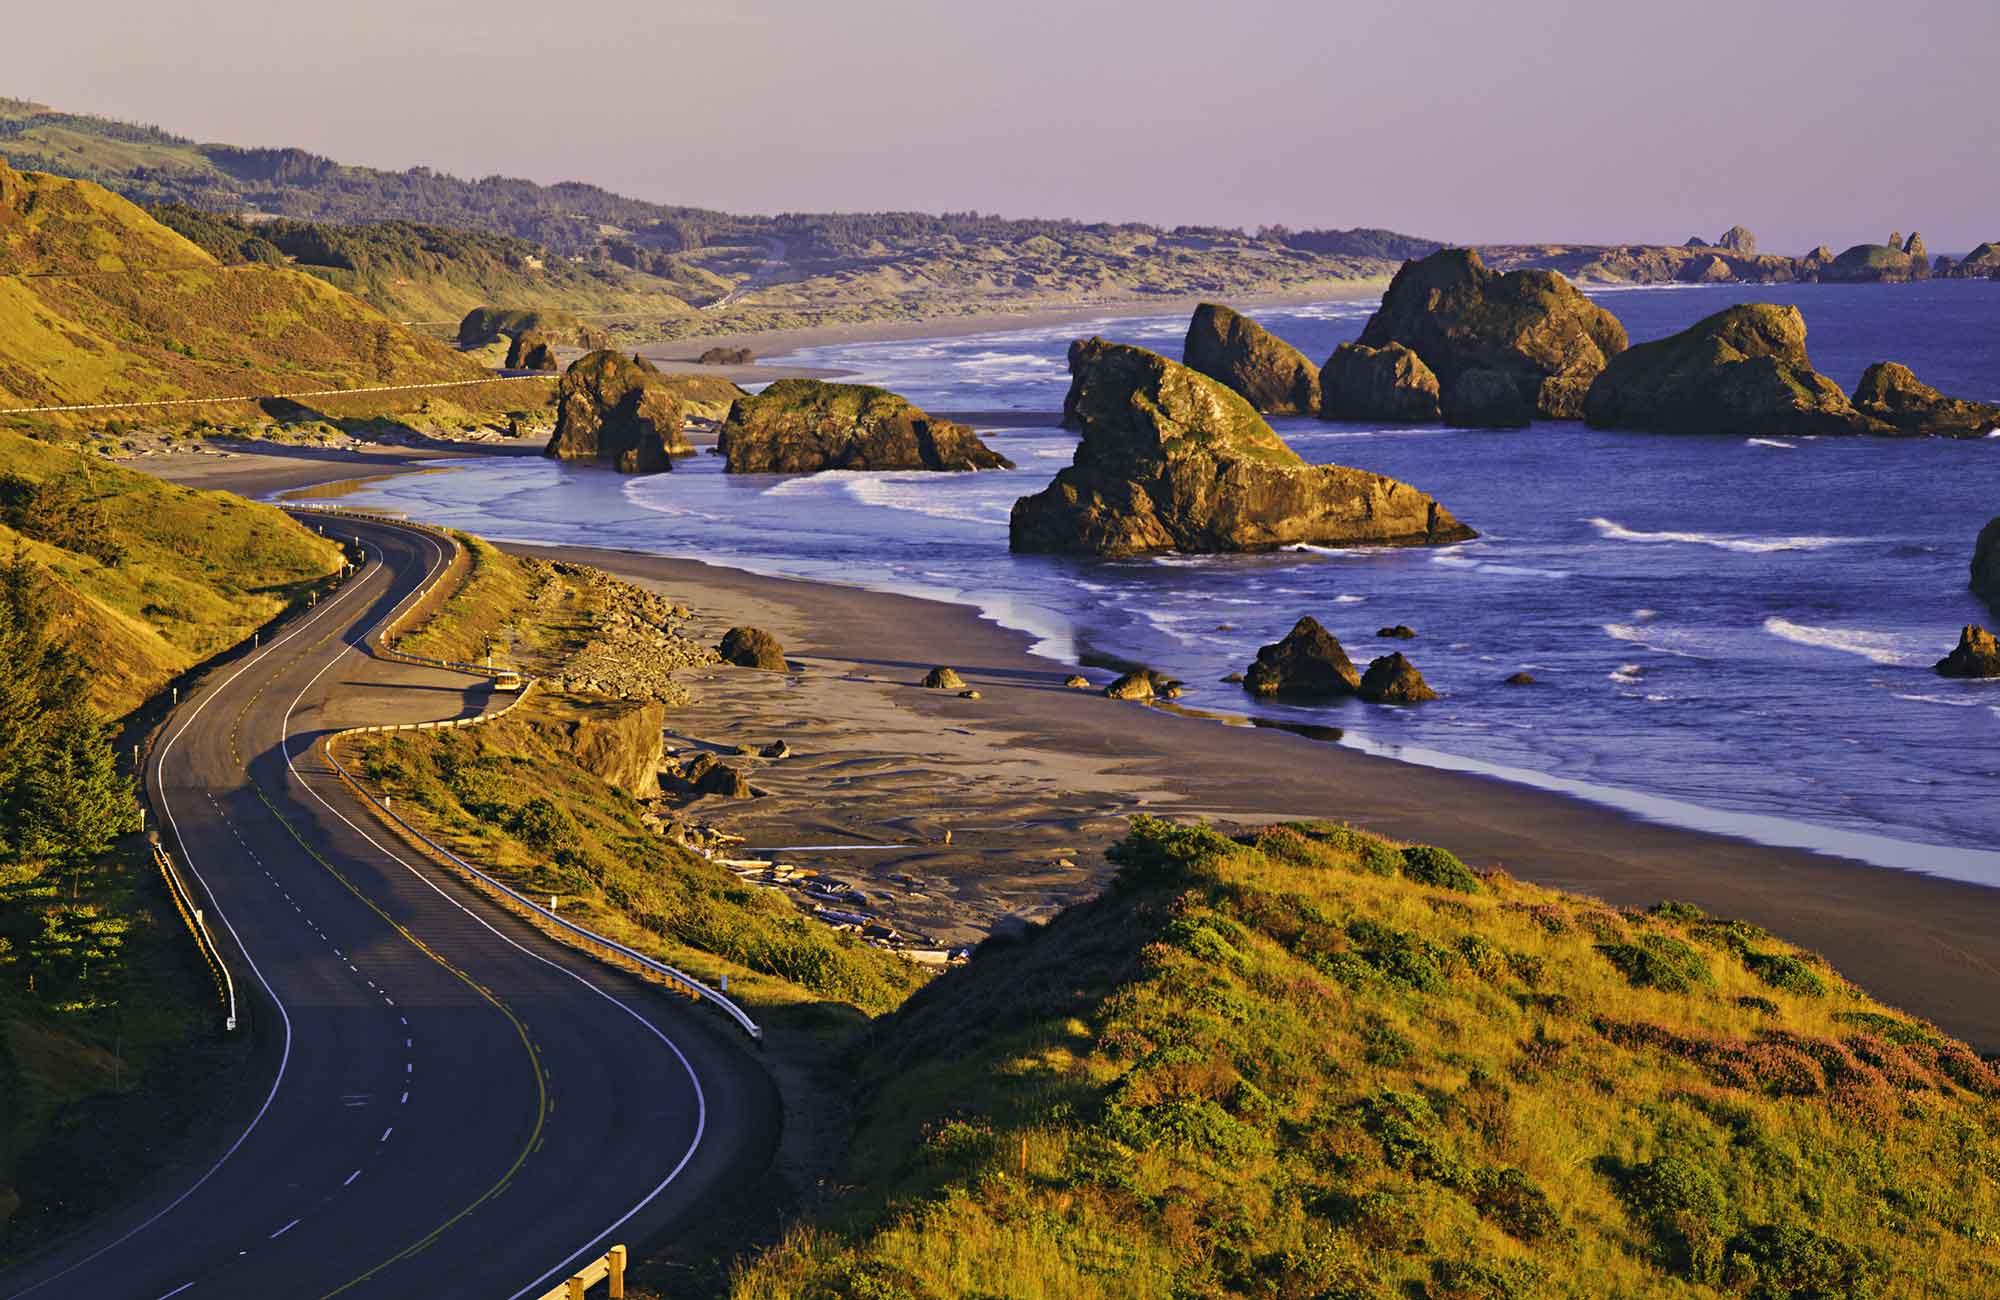 Voyage Etats-Unis - oregon-coast - Amplitudes